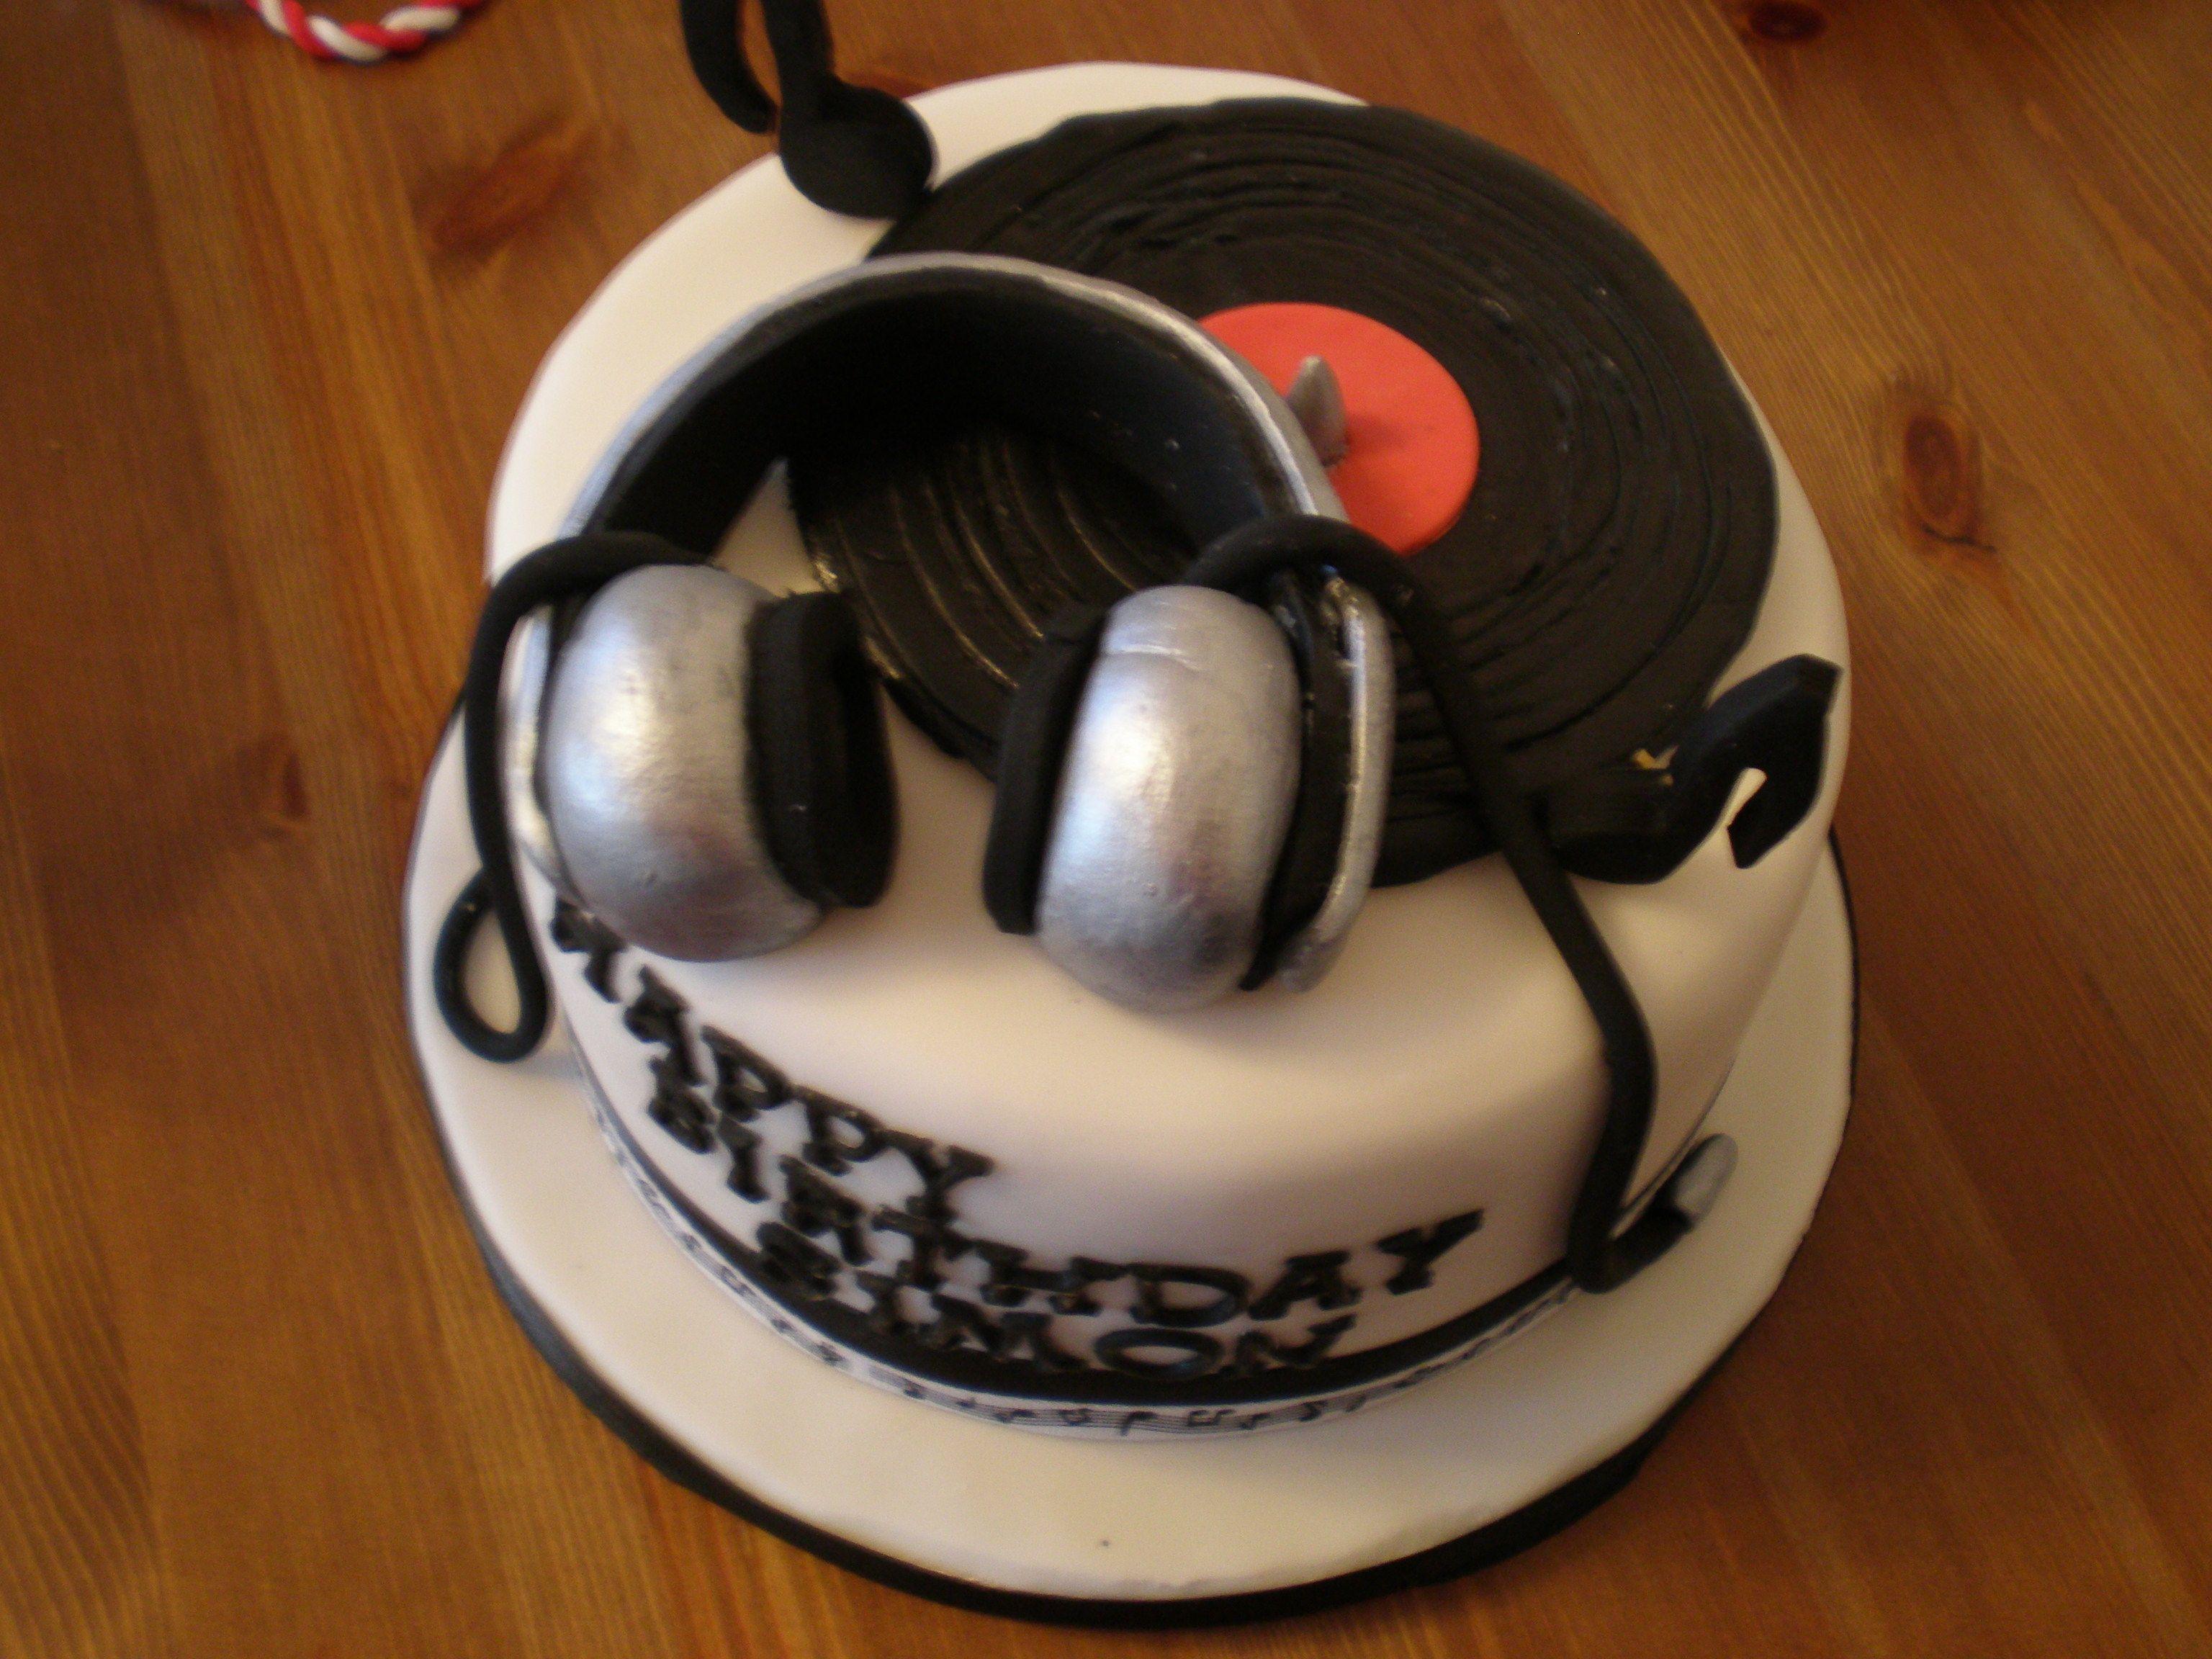 DJ Themed Birthday Cake Wwwkitchenfairiesleedscouk Cakes - Birthday cakes encinitas